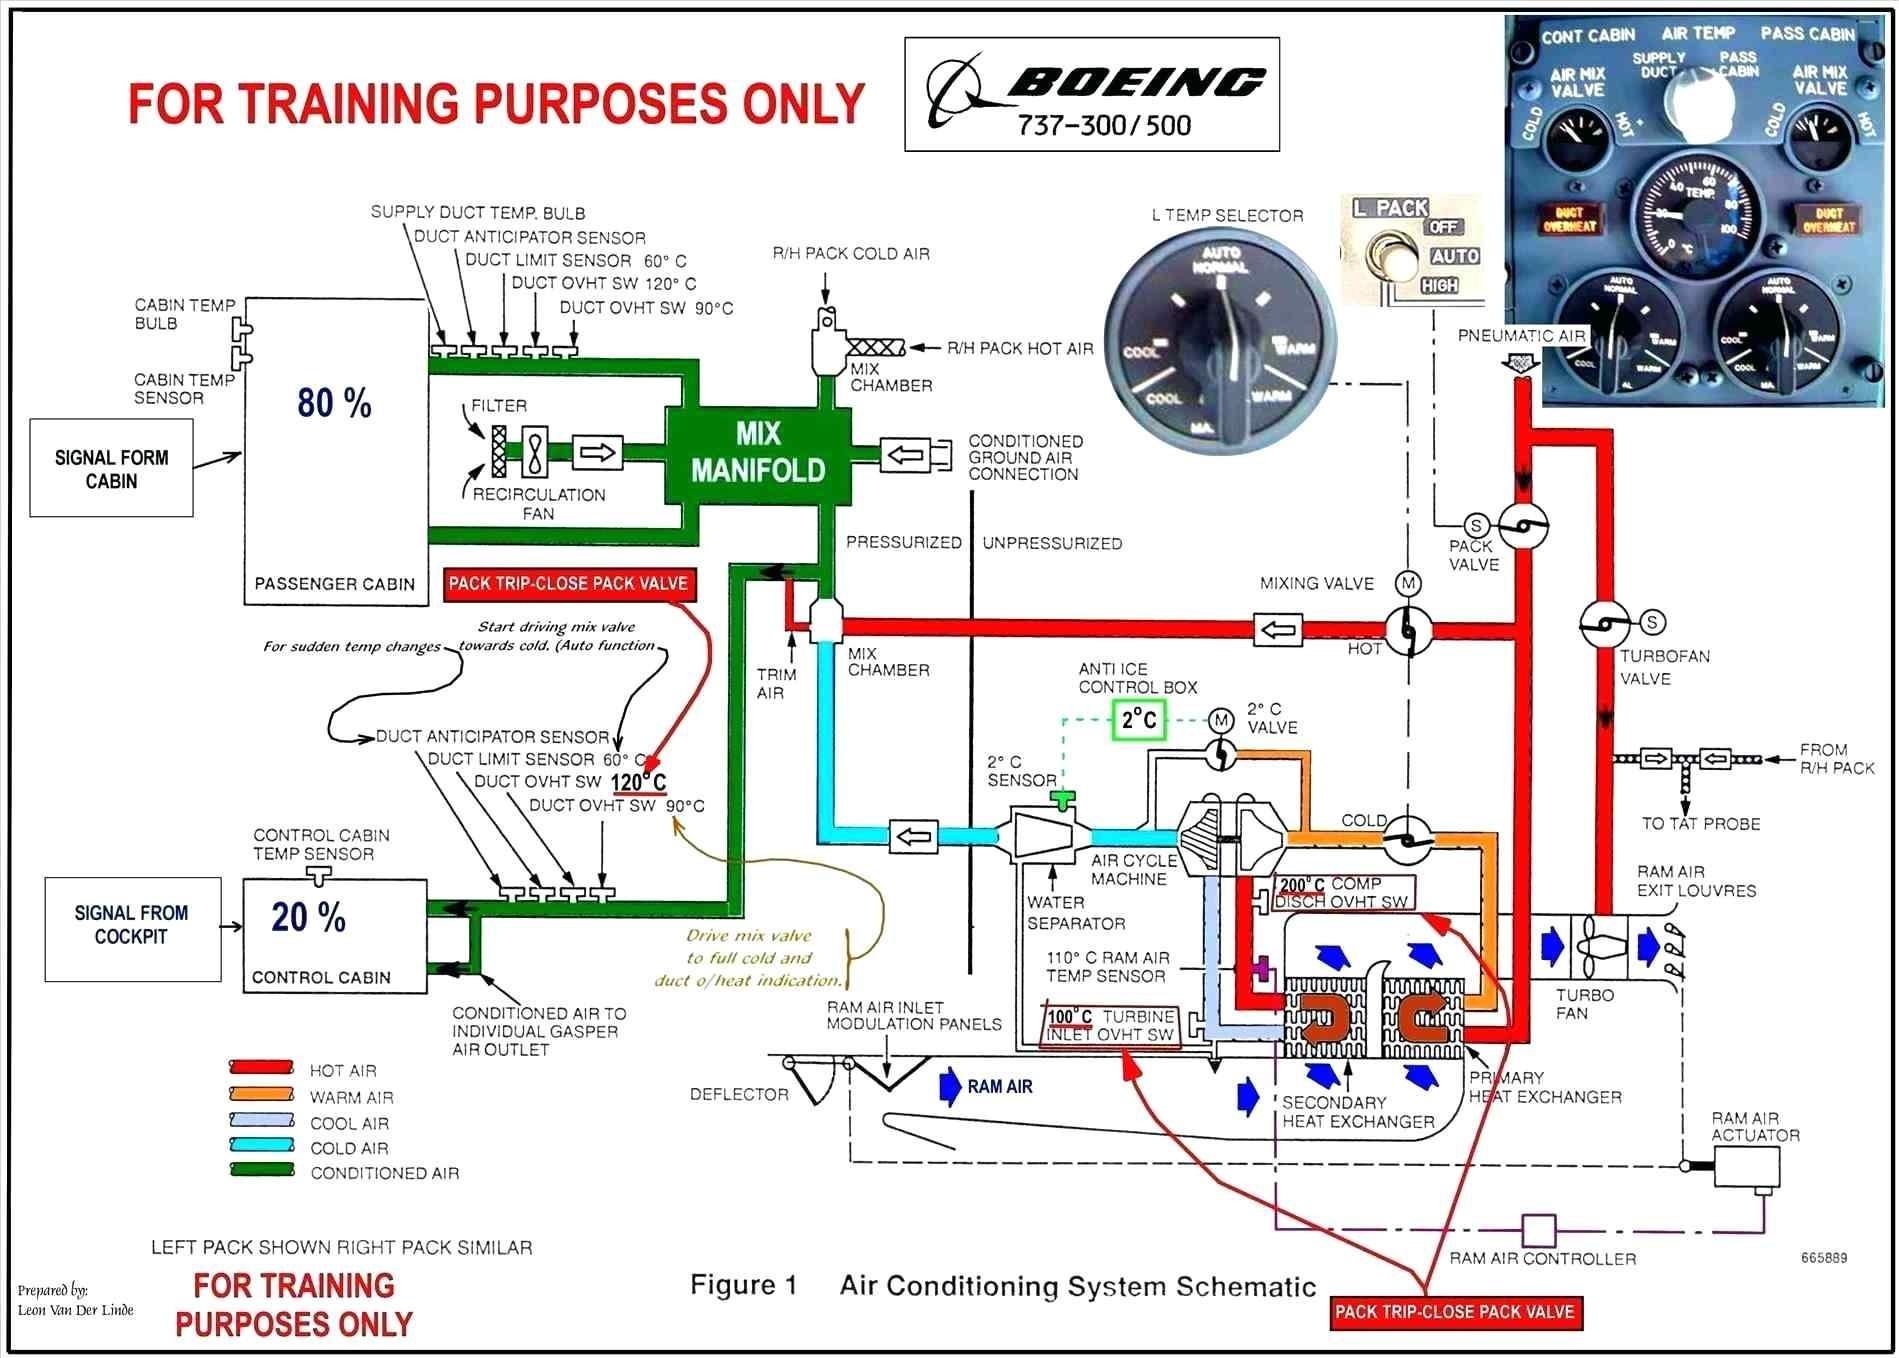 Auto Air Condition System Diagram Car Diagram Car Diagram Wiring Split Air Conditioner Conditioning Of Auto Air Condition System Diagram